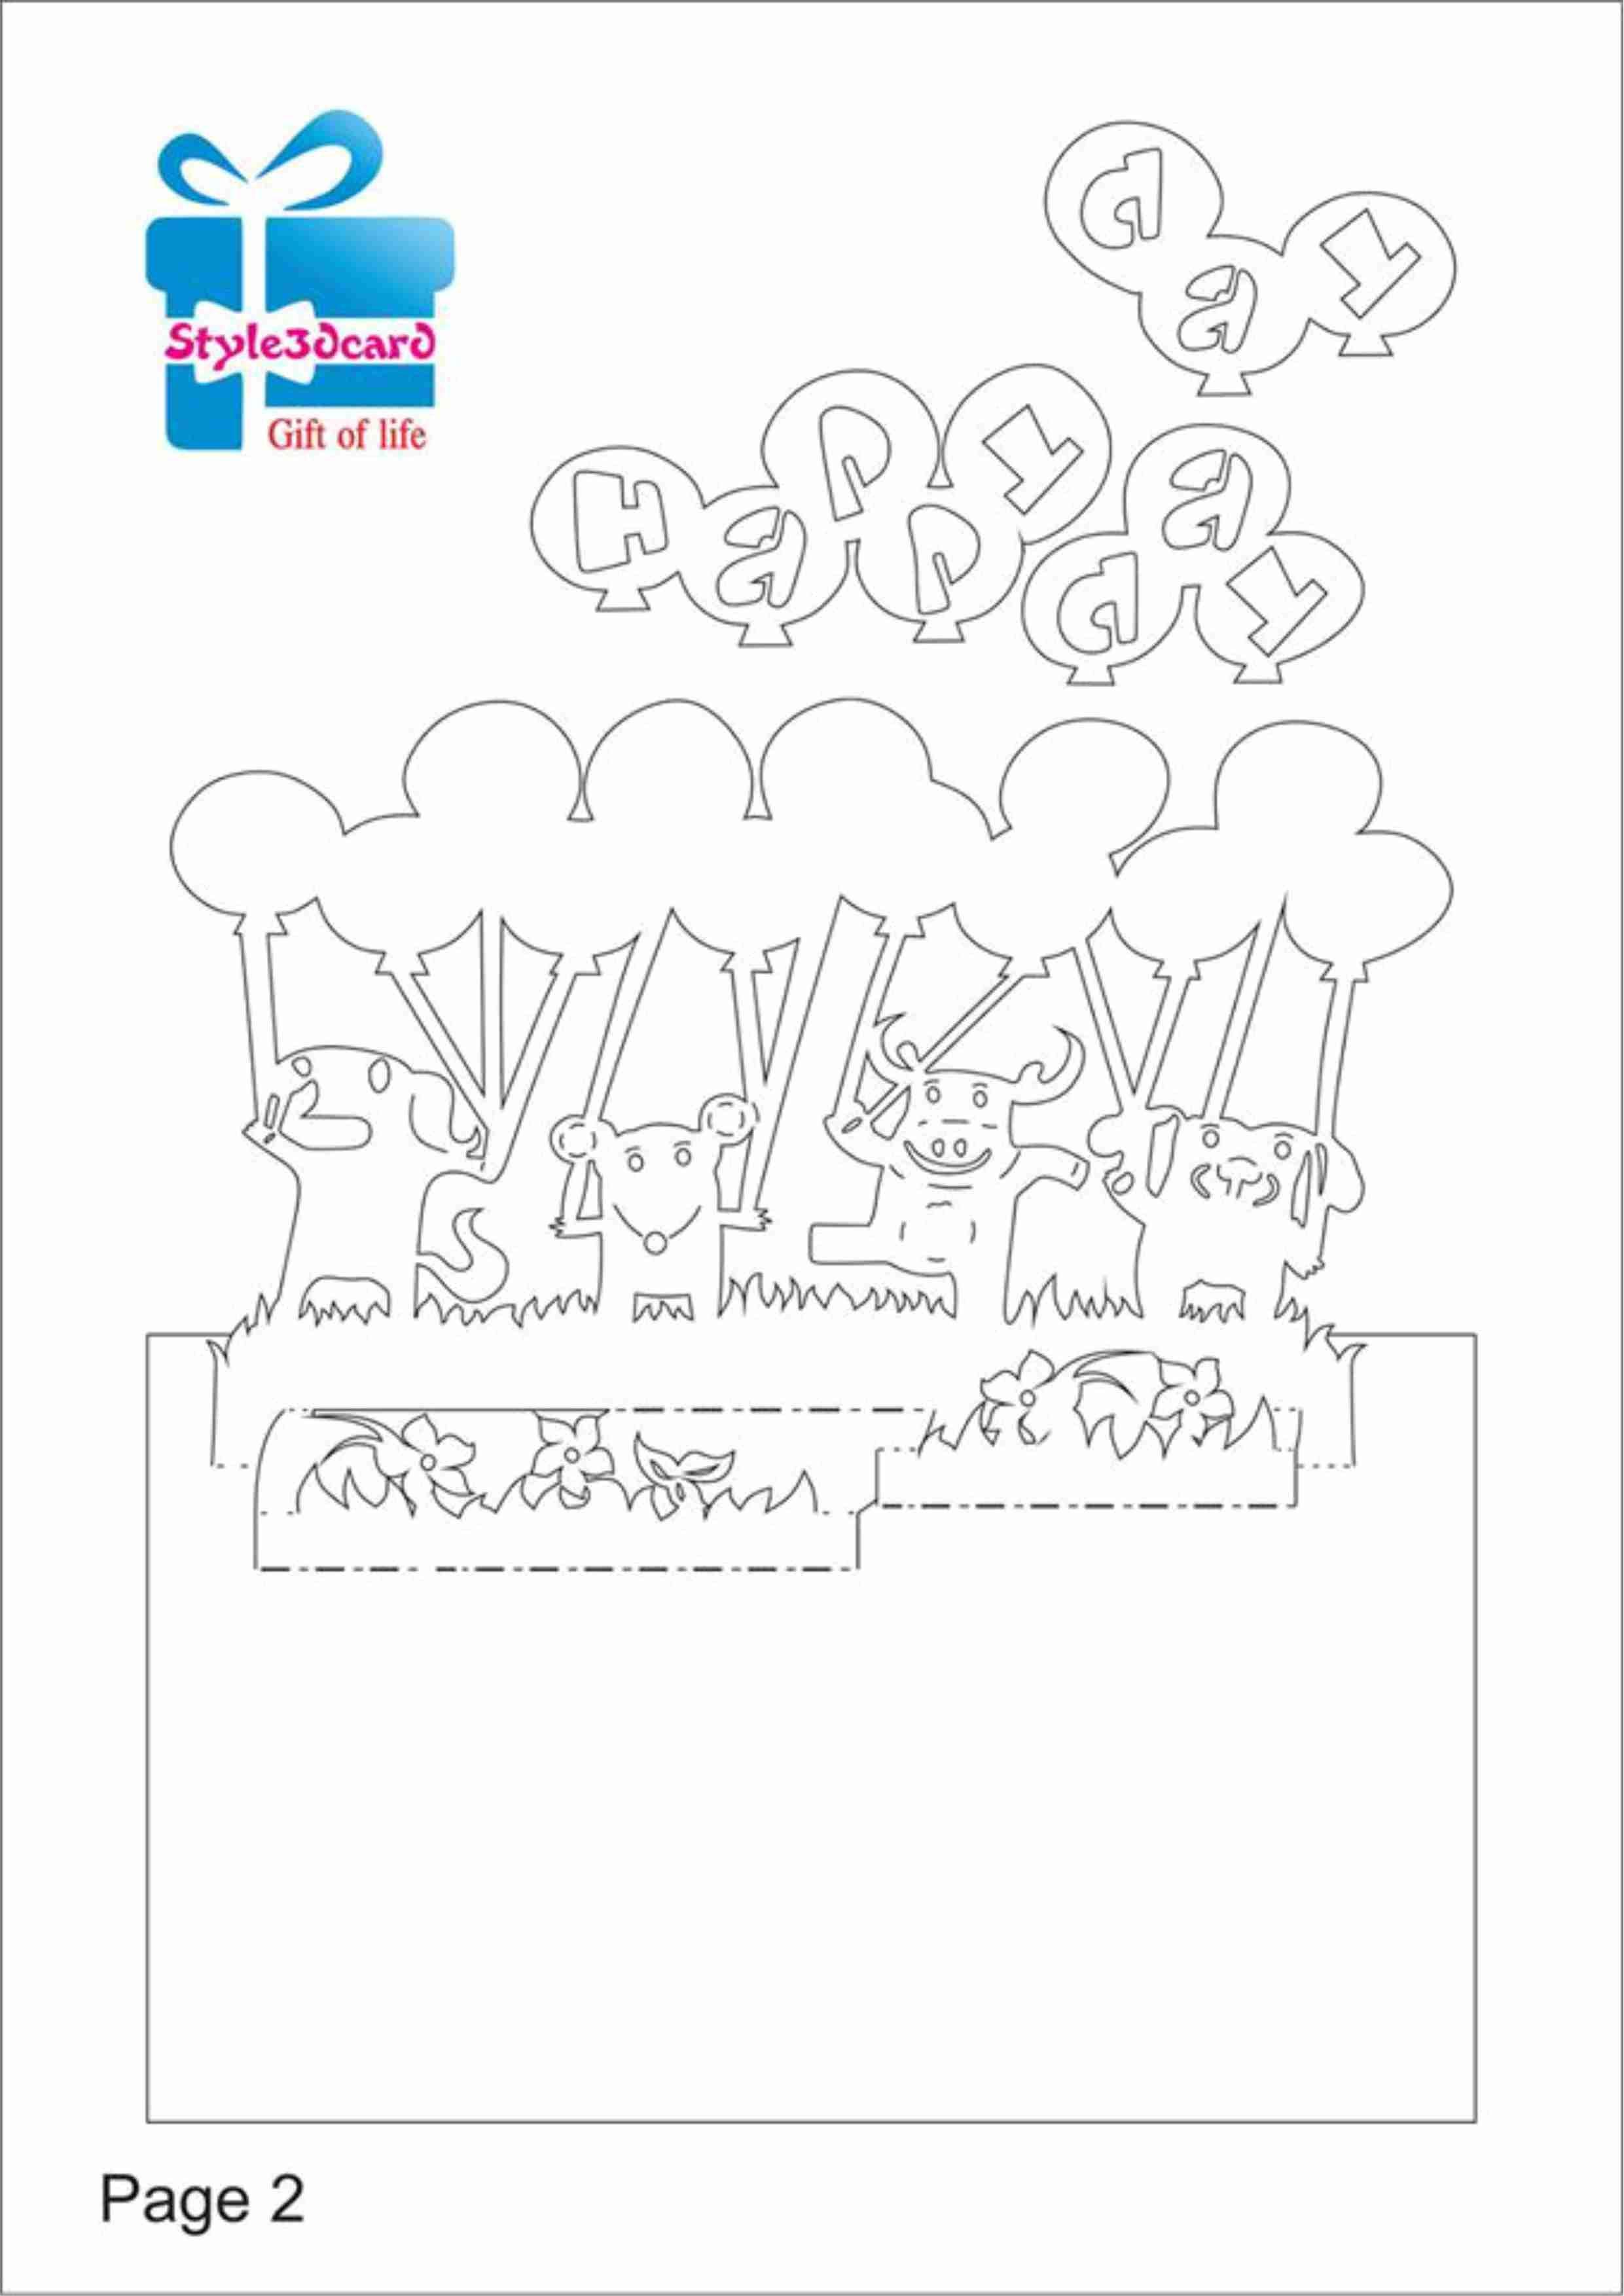 Happy Birthday Card Gift Card For Birthday Kirigami Pattern 1